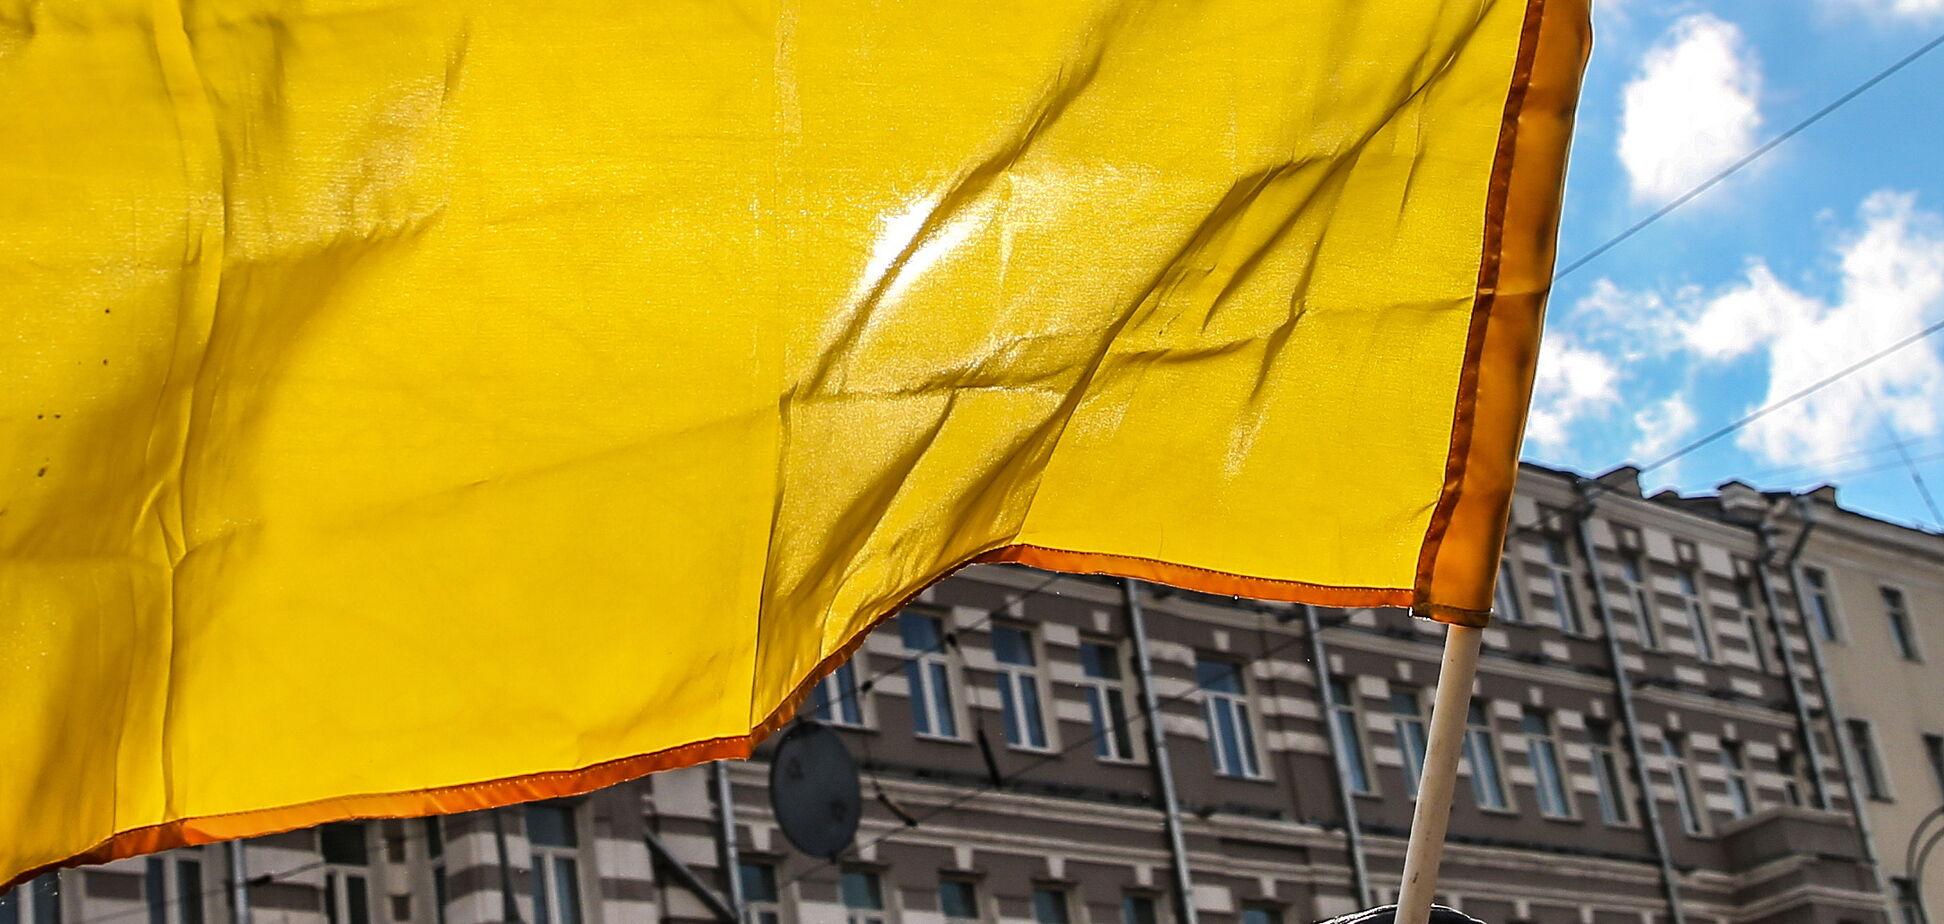 Реформ не будет? ЕБРР озвучил прогноз по Украине на 2018 год